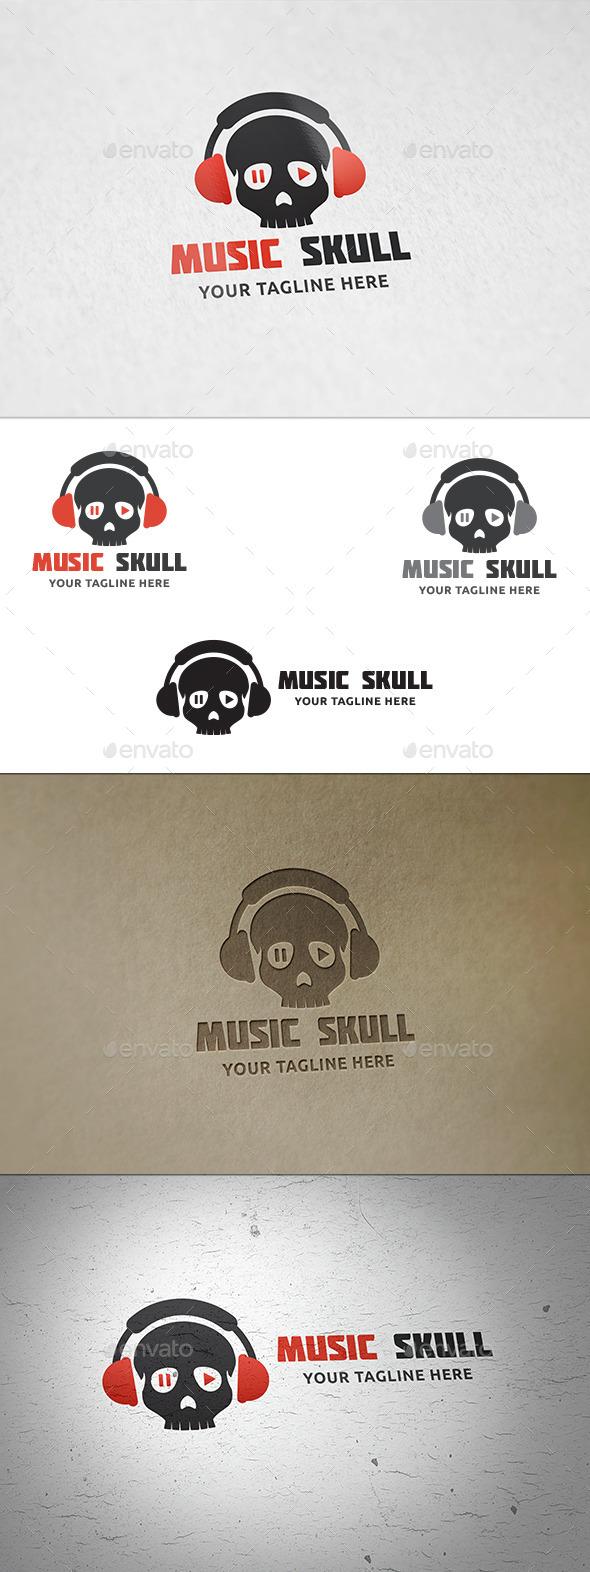 Music Skull - Logo Template - Symbols Logo Templates